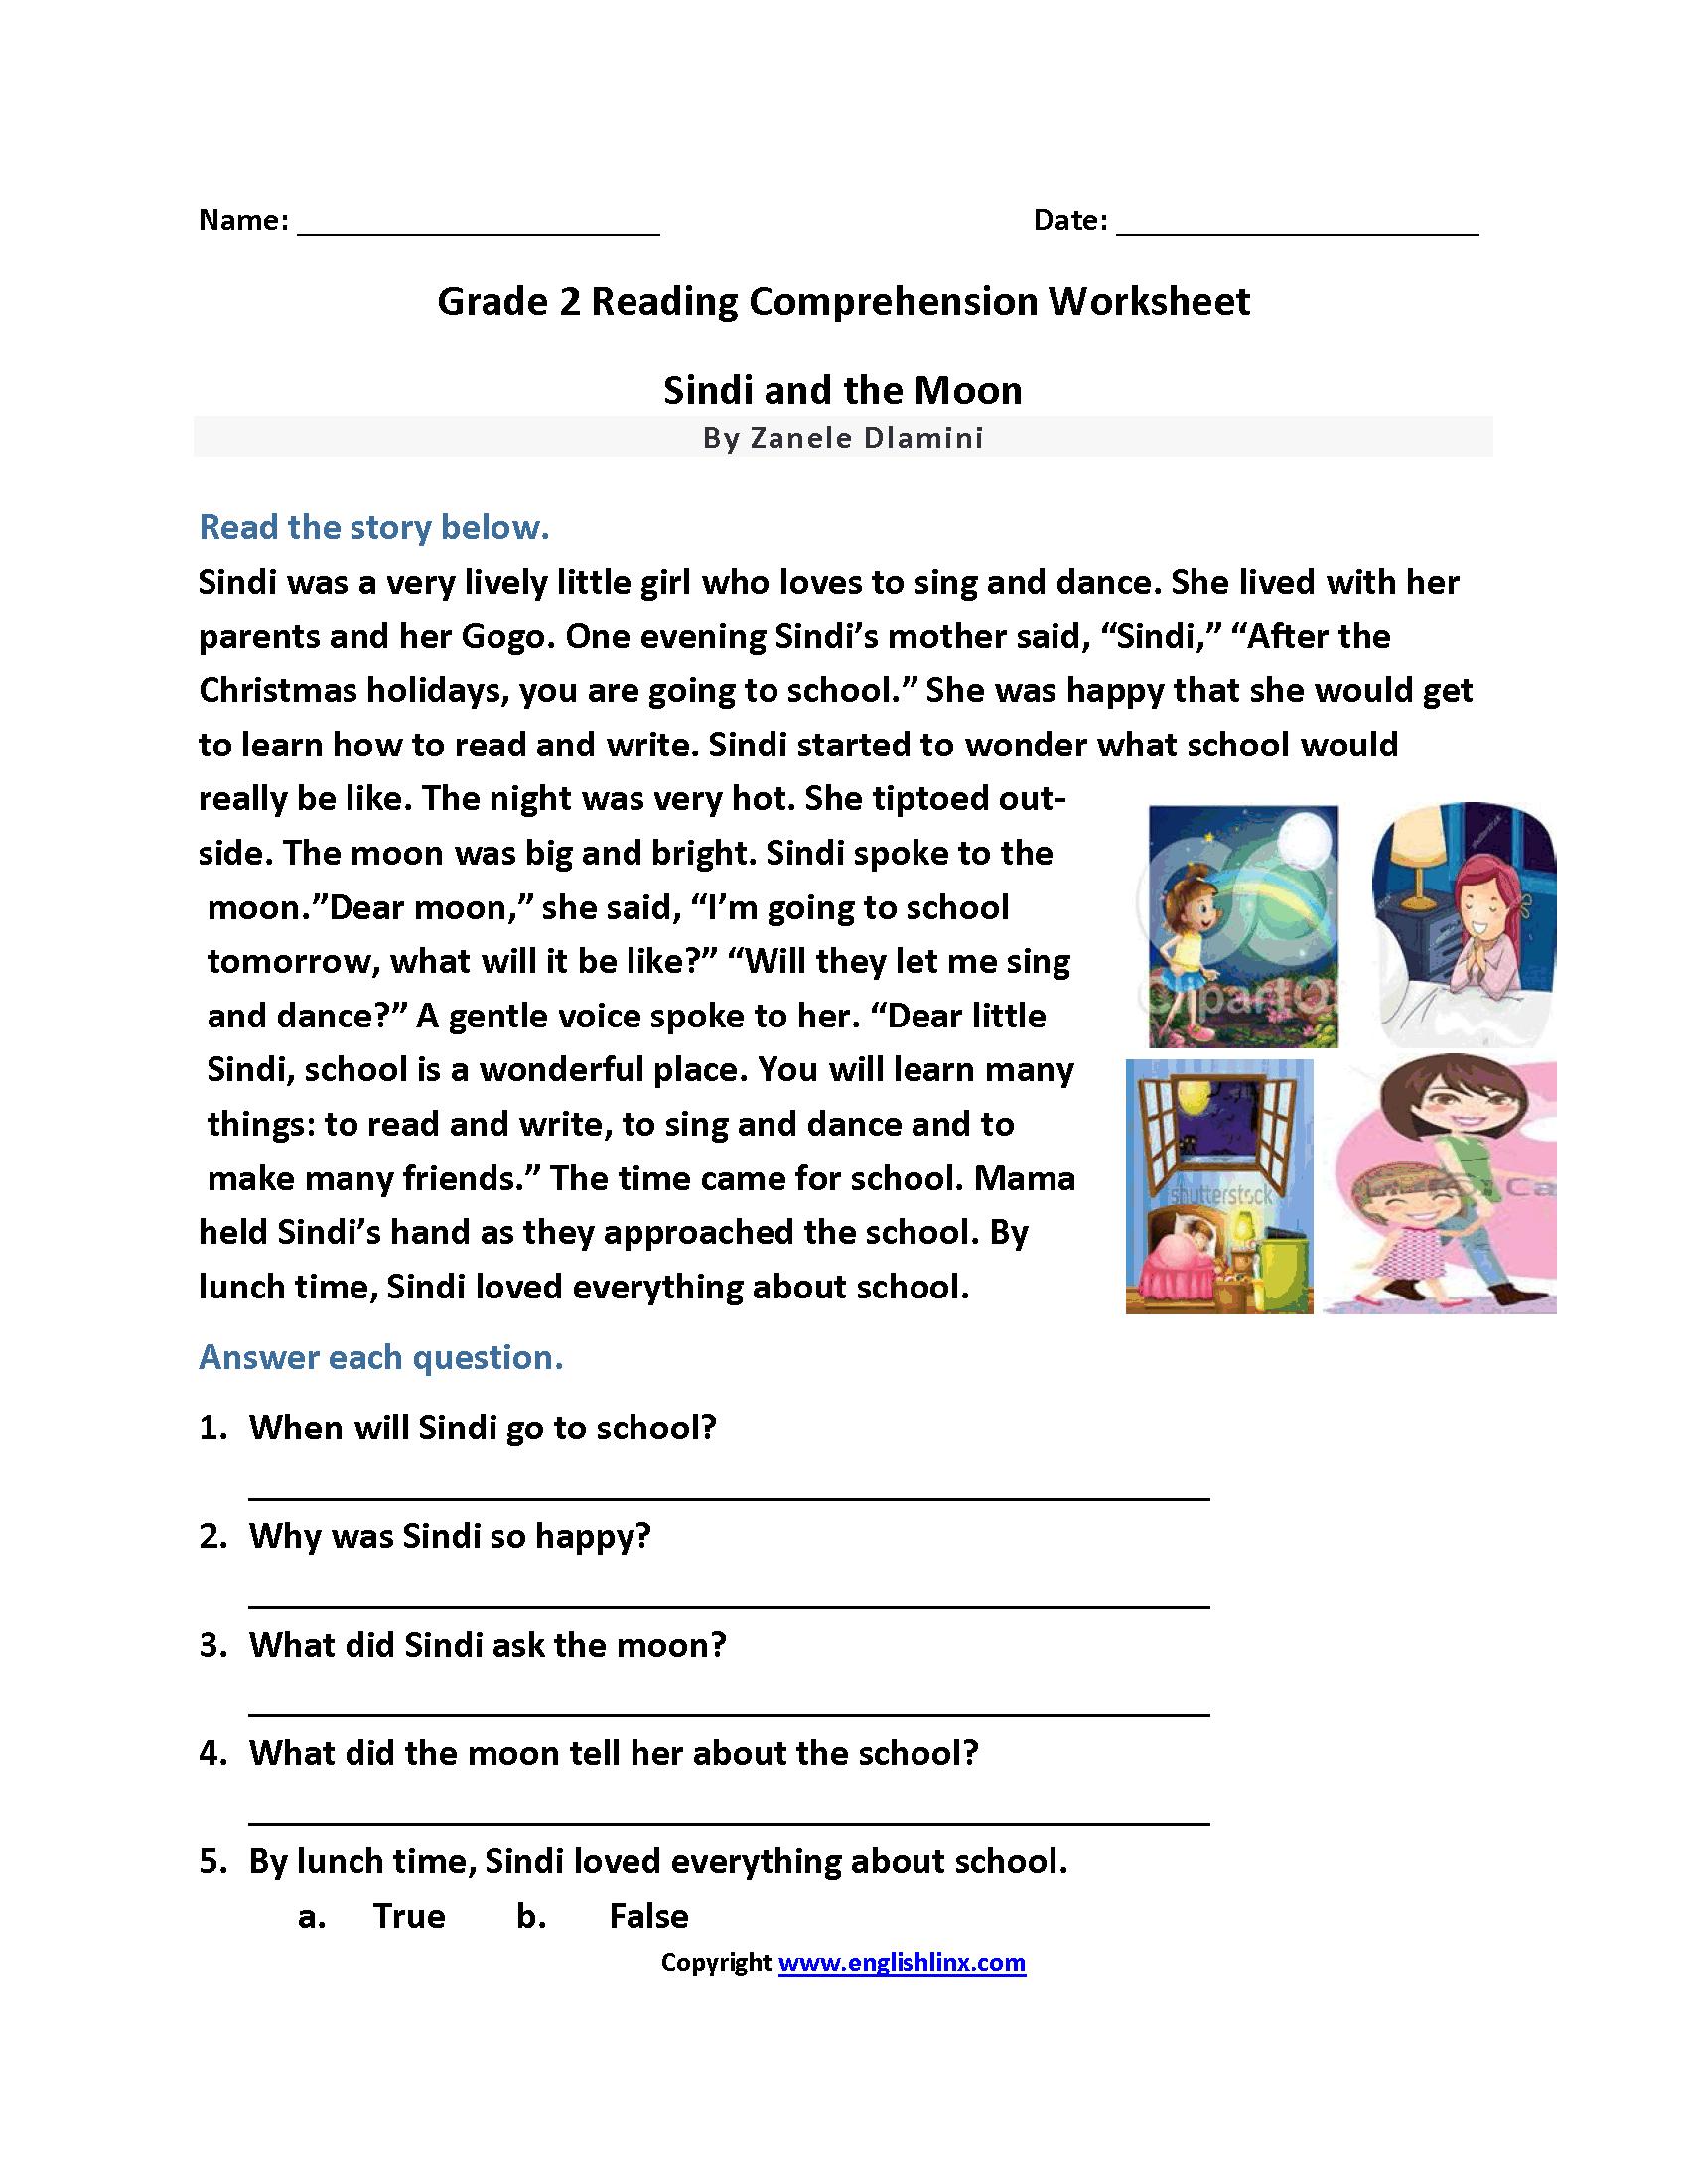 Reading Worksheets  Second Grade Reading Worksheets Intended For Reading Comprehension Worksheets For 2Nd Grade